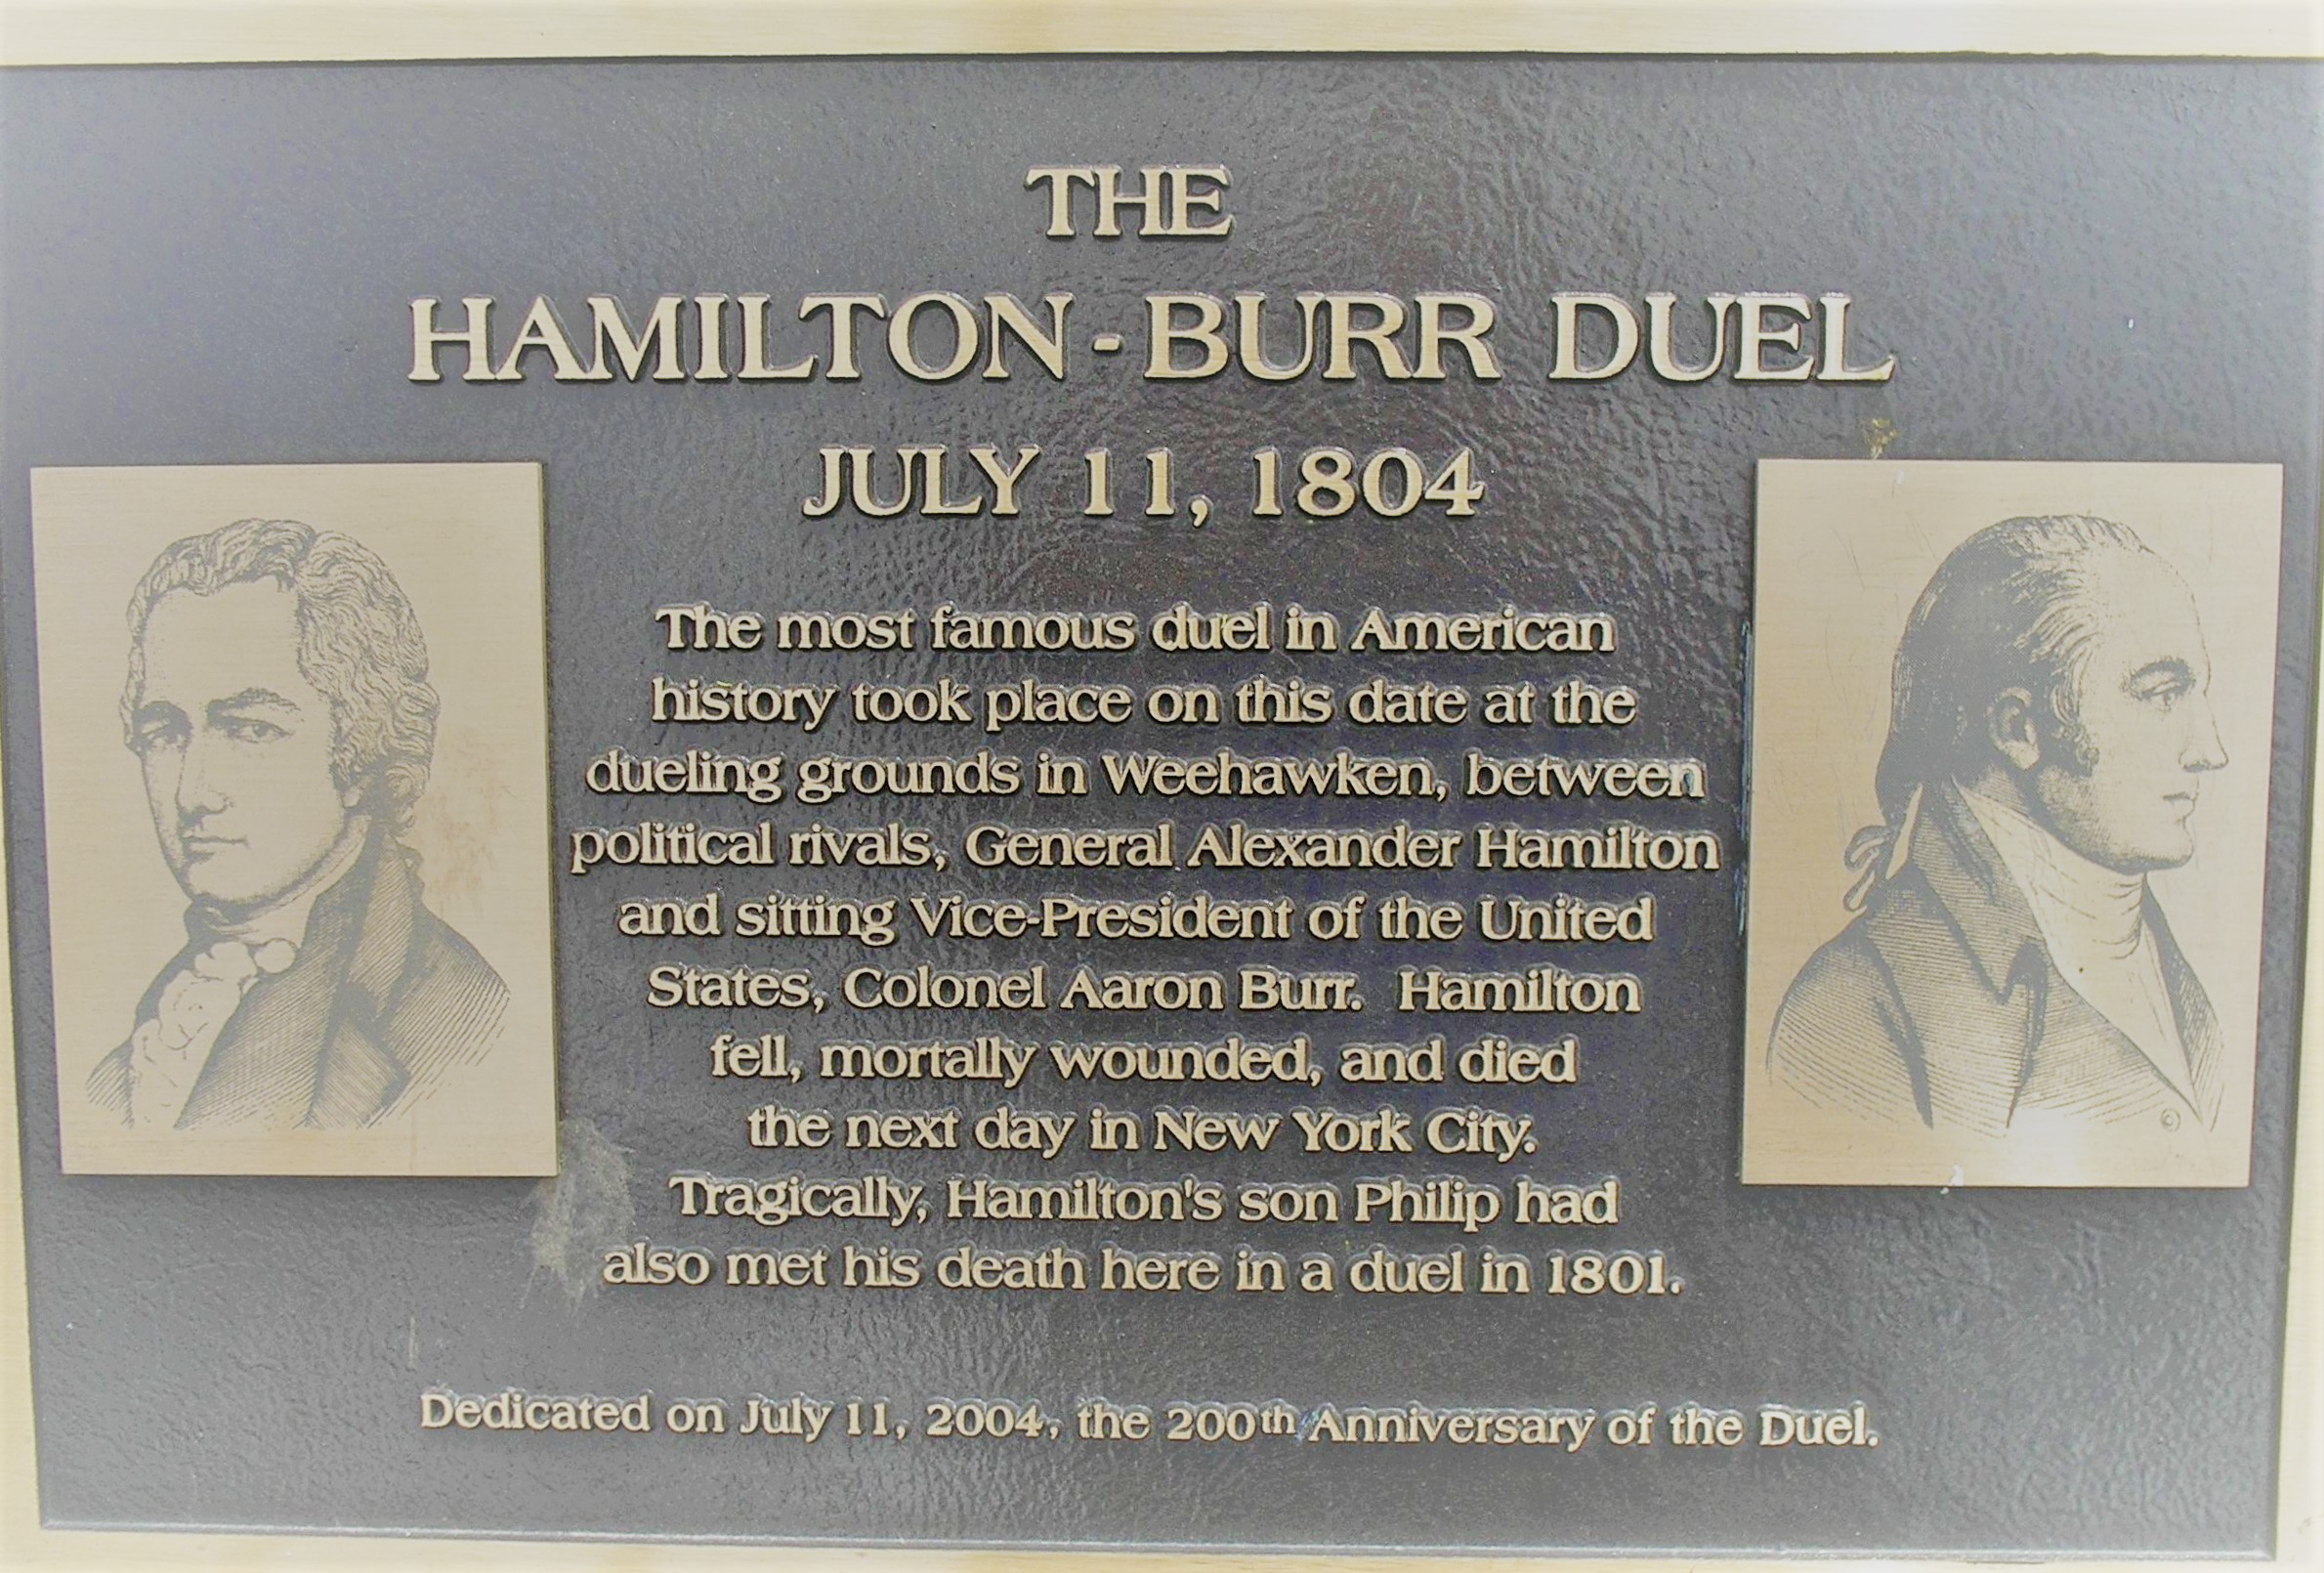 Black, Font, Commemorative plaque, History